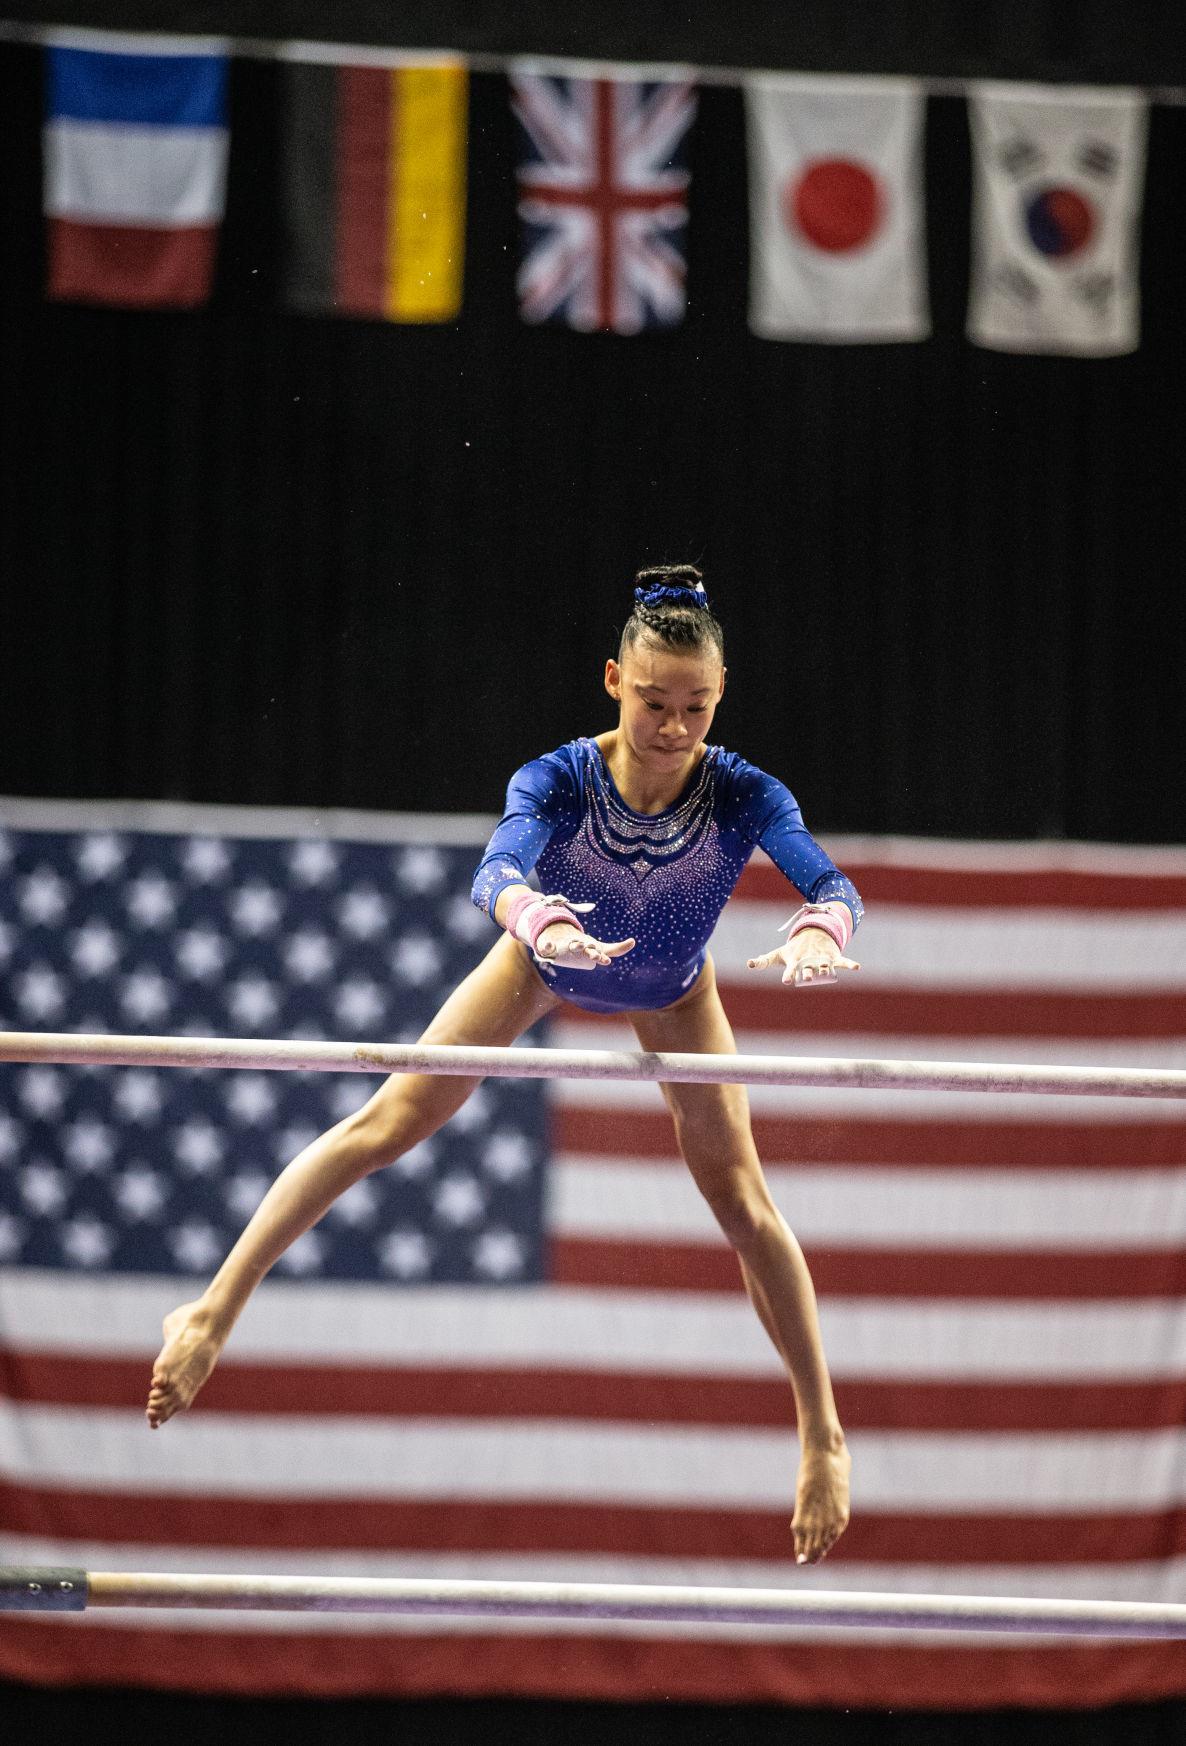 american gambling gymnastics sports